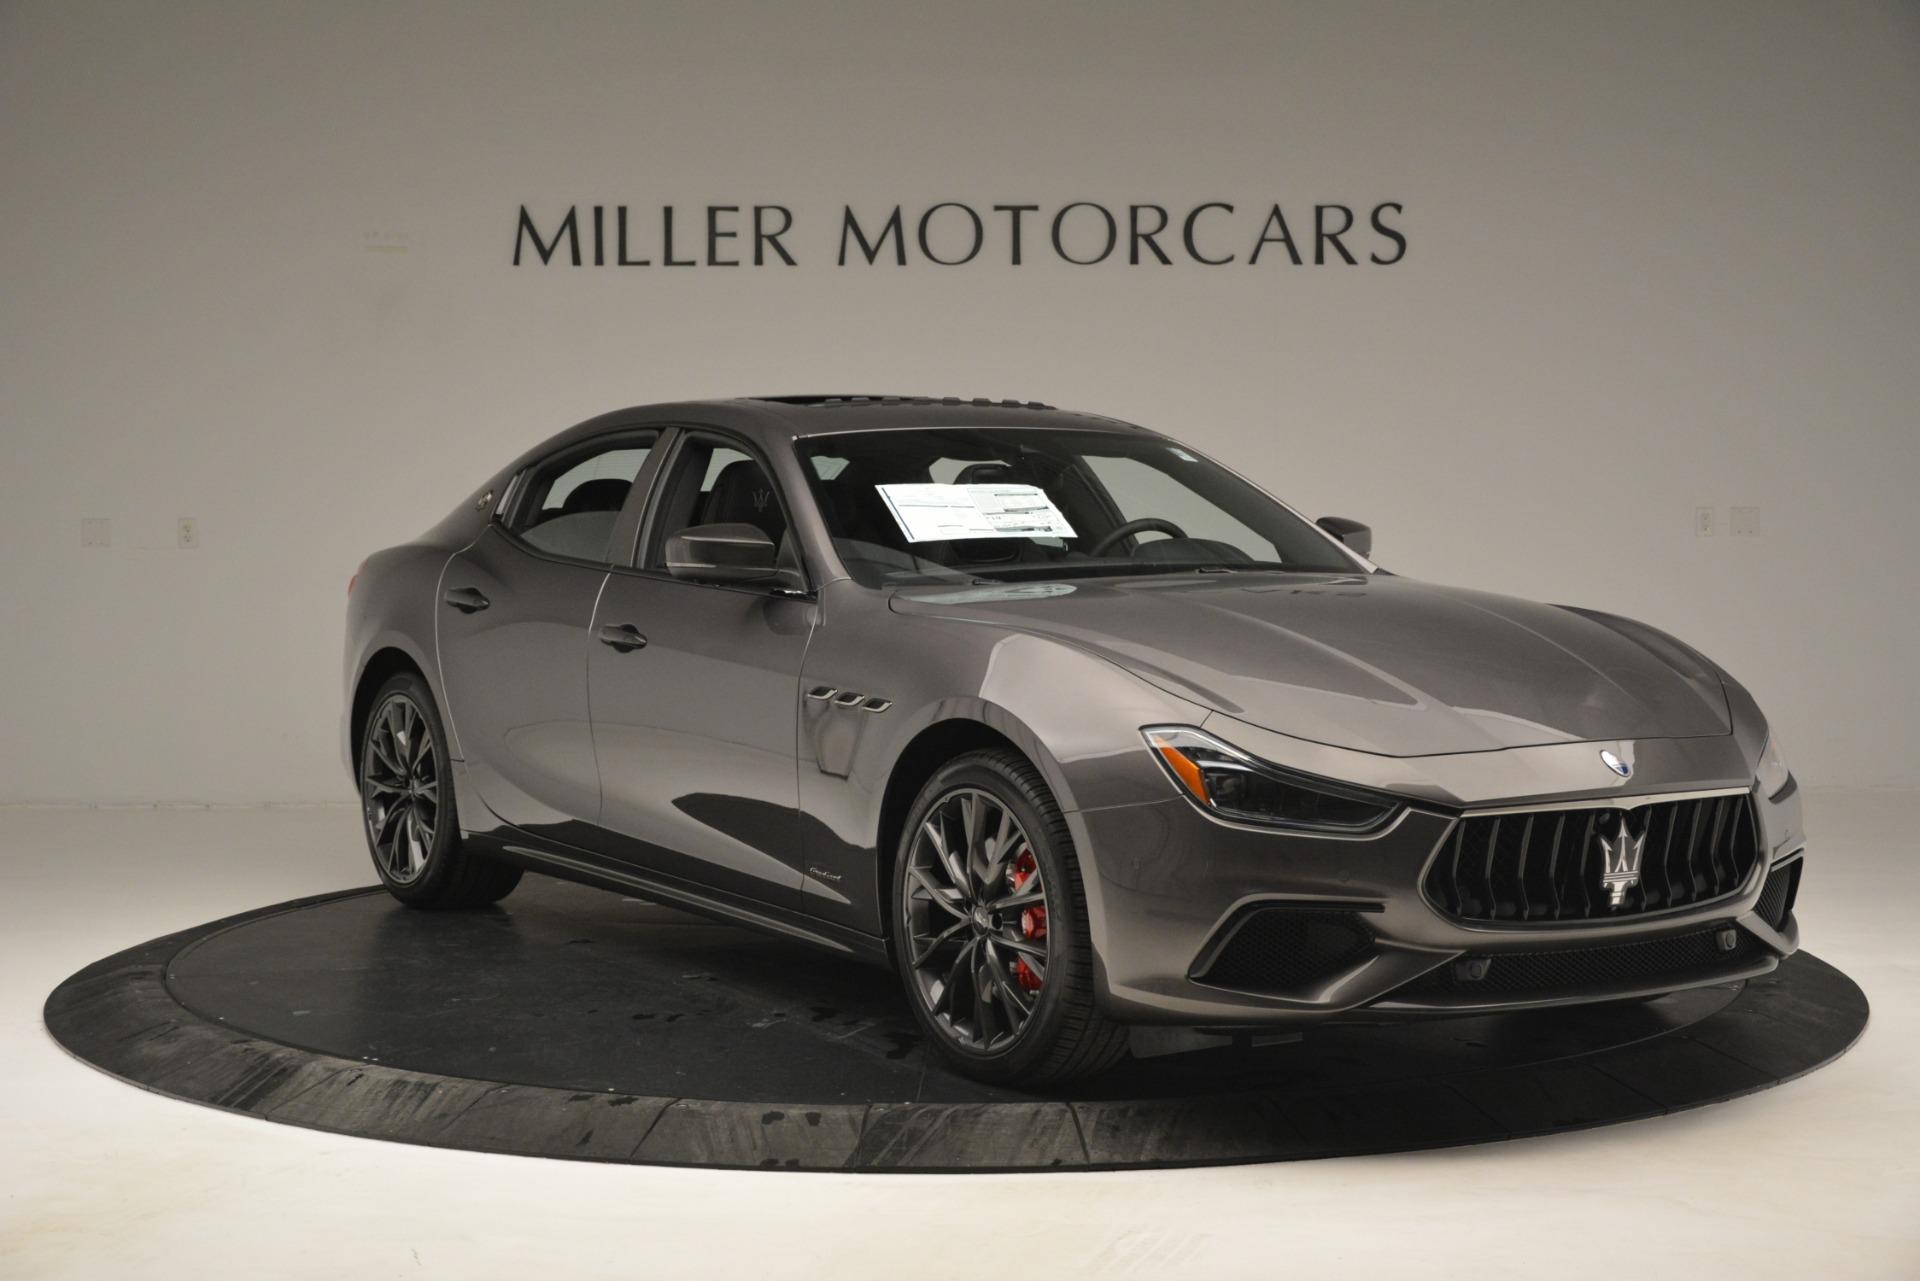 New 2019 Maserati Ghibli S Q4 GranSport For Sale In Westport, CT 2925_p12